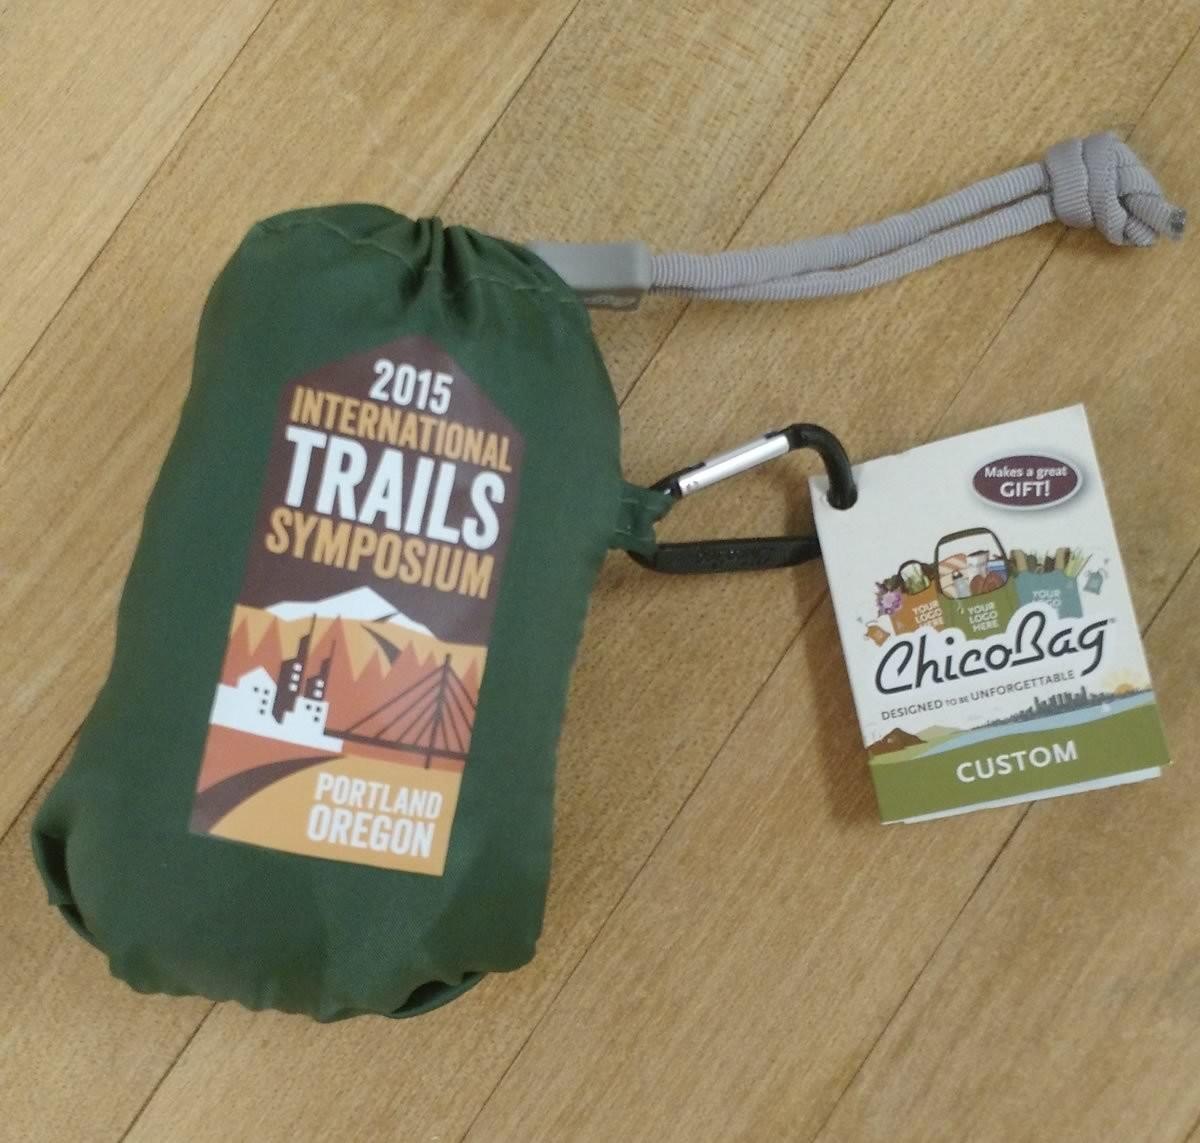 2015 International Trails Symposium ChicoBag